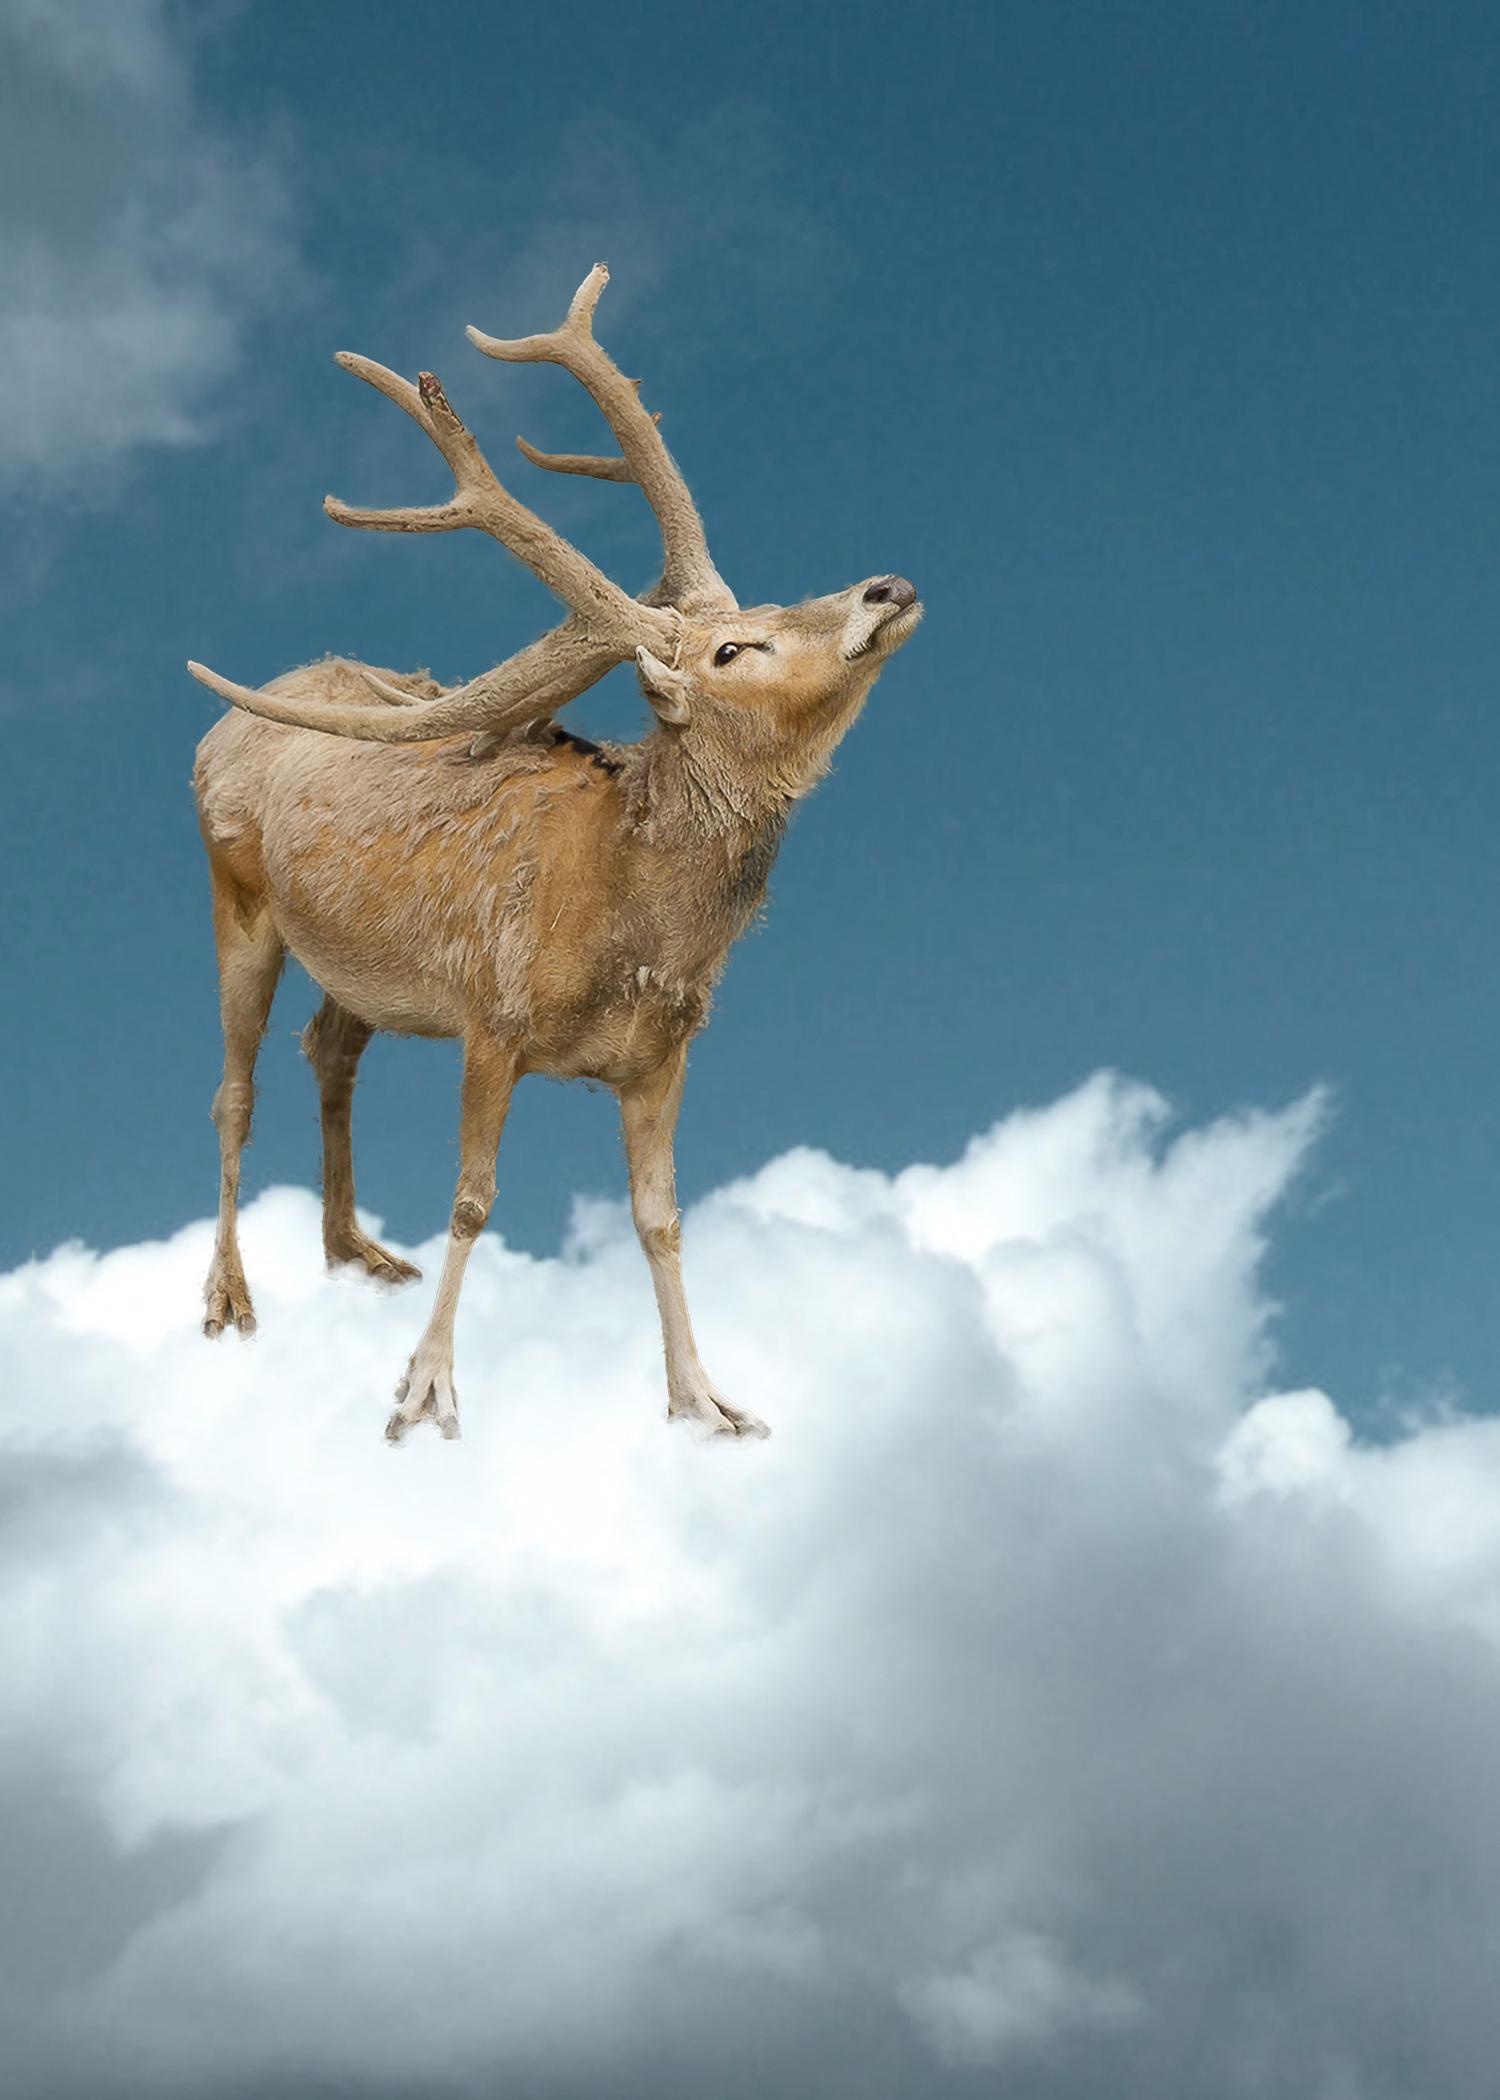 CENERINI_Cessation_(Père_David's_Deer)